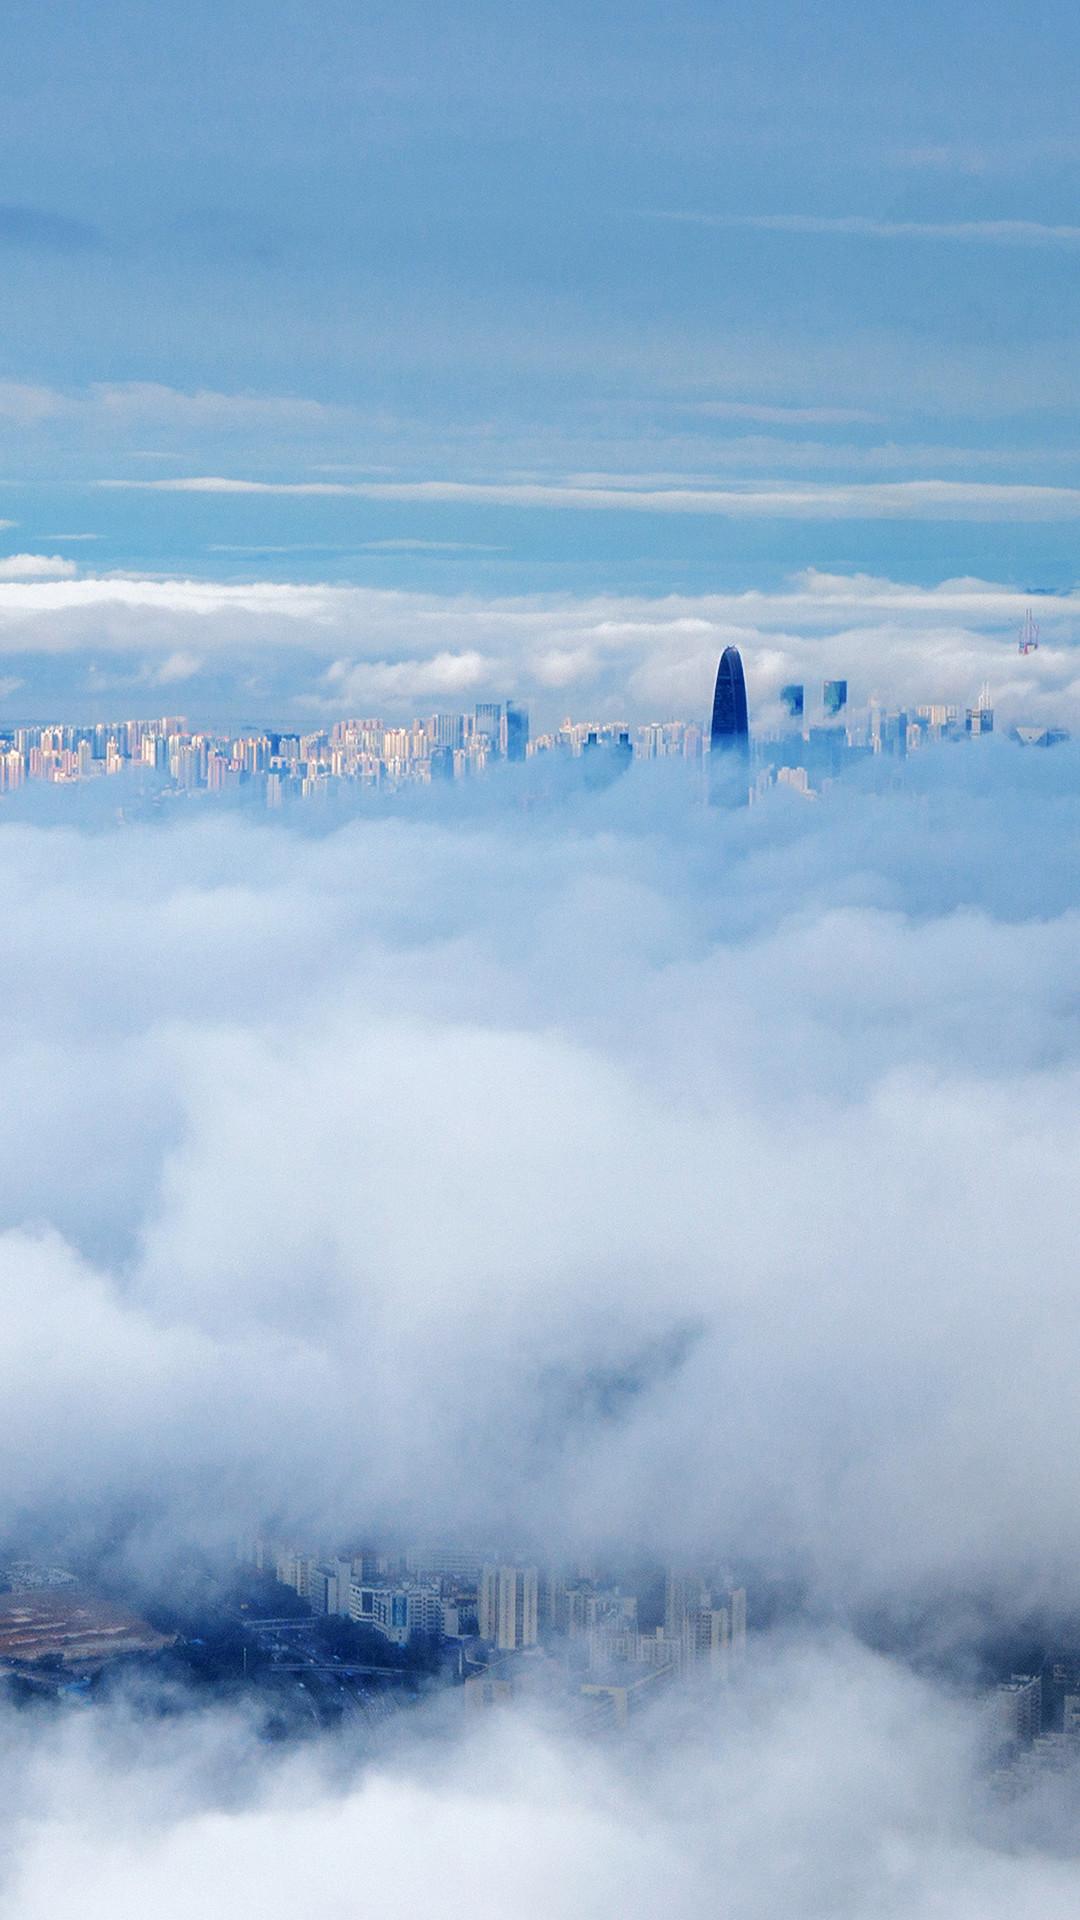 City In Fog Cloud Nature Sky iPhone 6 wallpaper